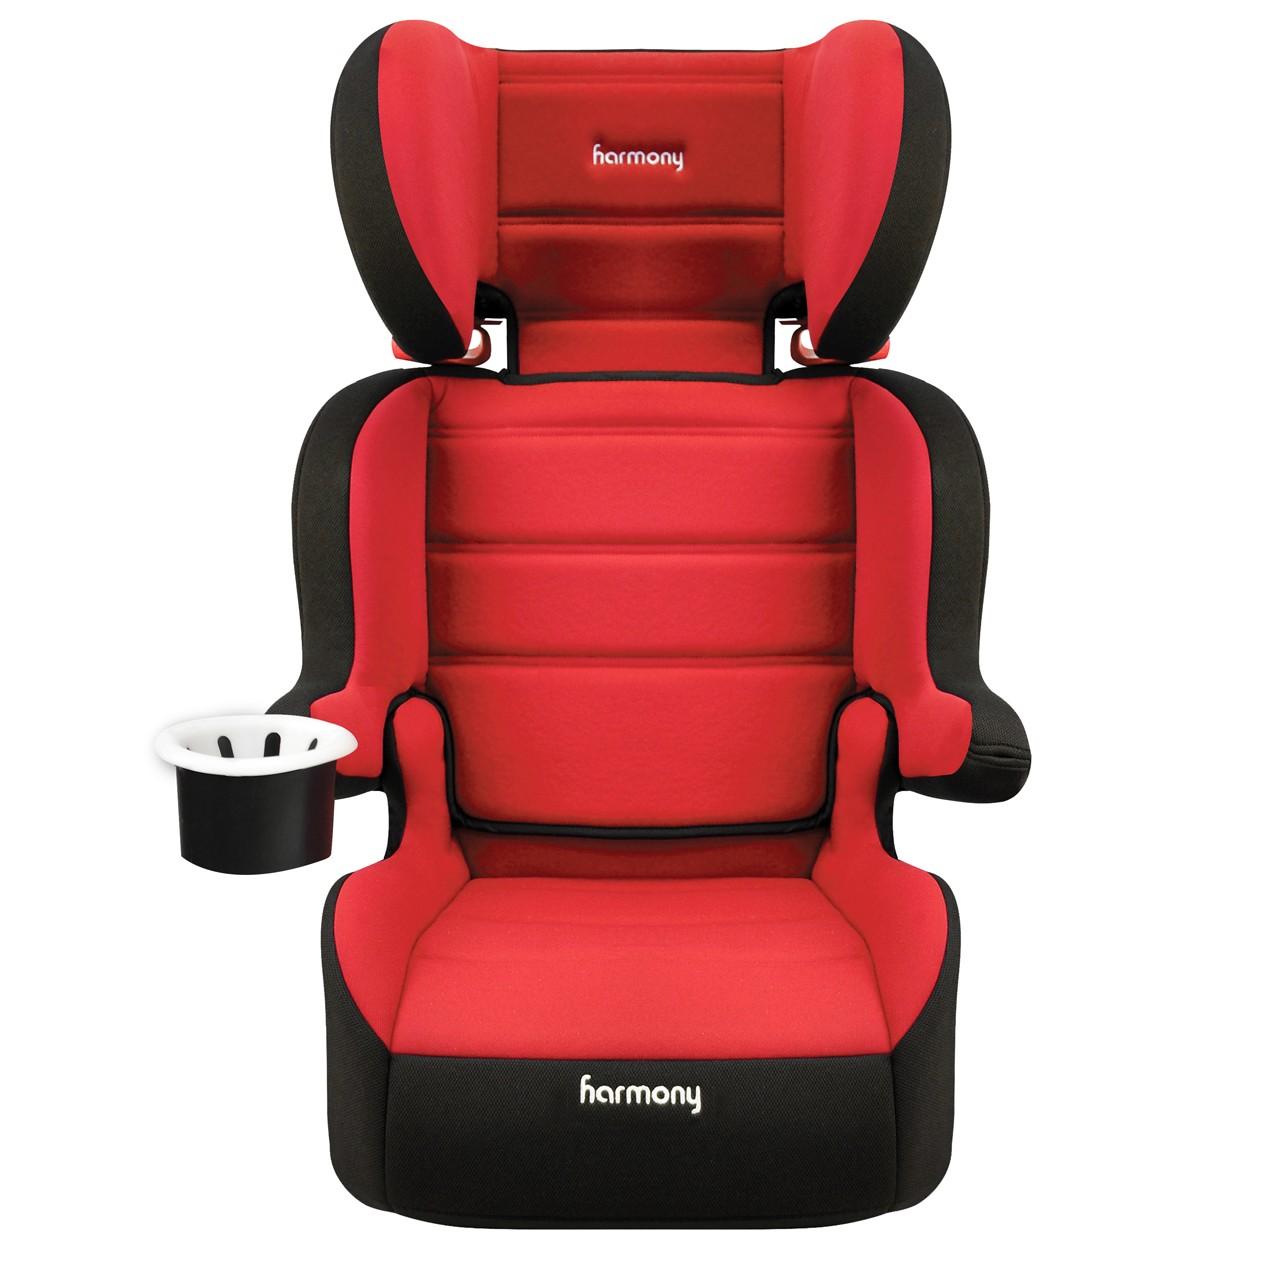 harmony high chair recall reclining salon uk folding travel booster seat world traveler edition